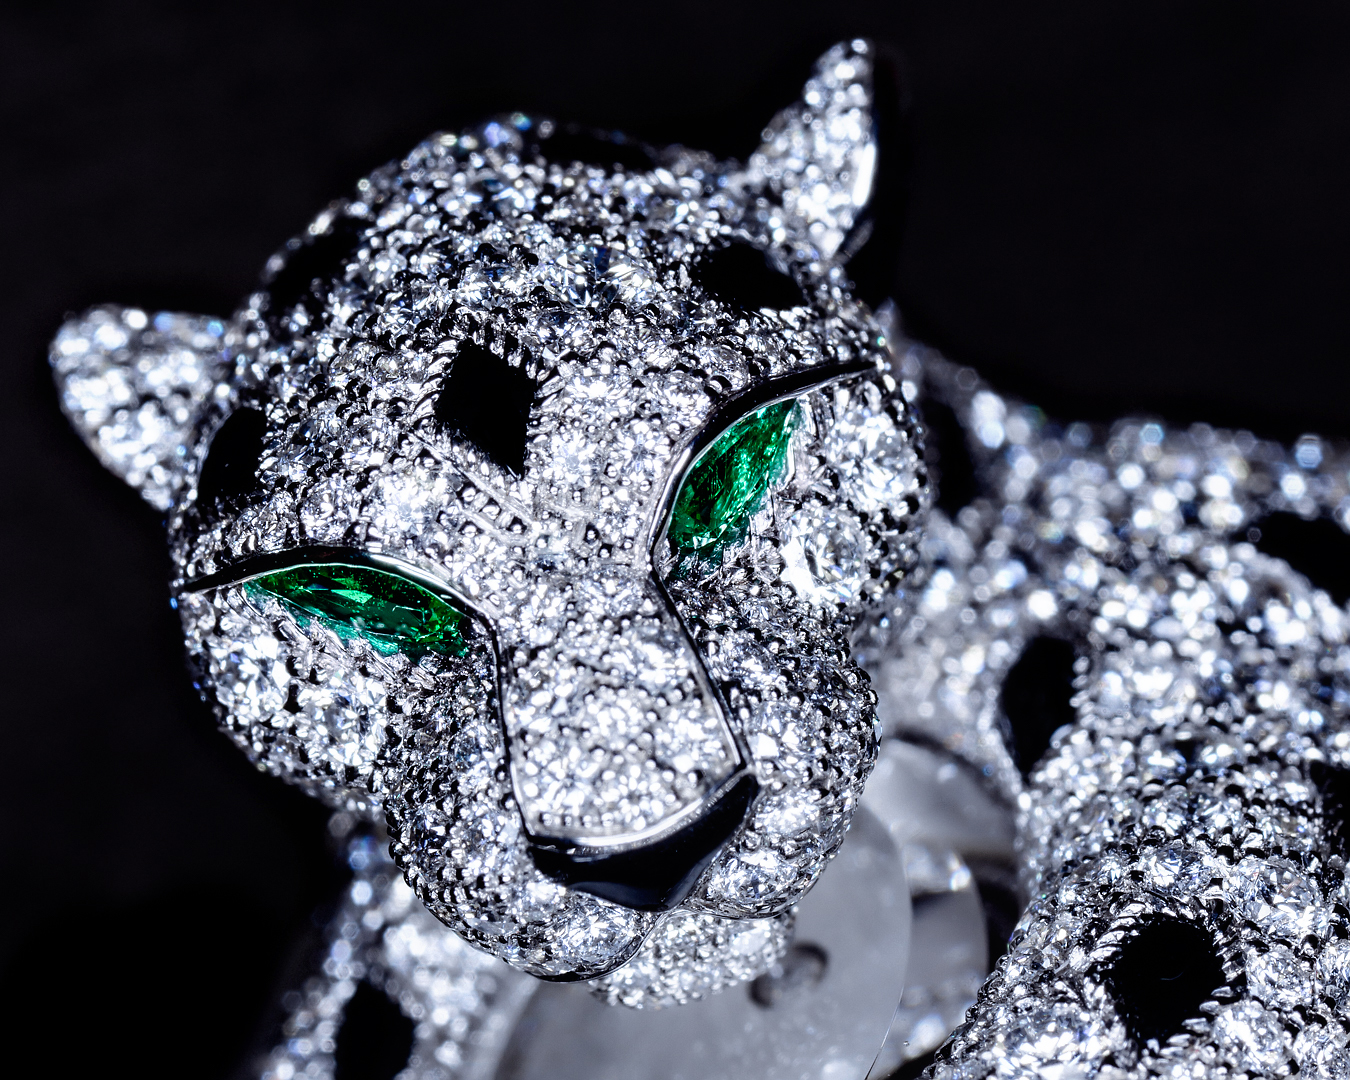 cartier panthere gardienne high jewellery wristwatch still life orologio pantera alta gioielleria alberto feltrin